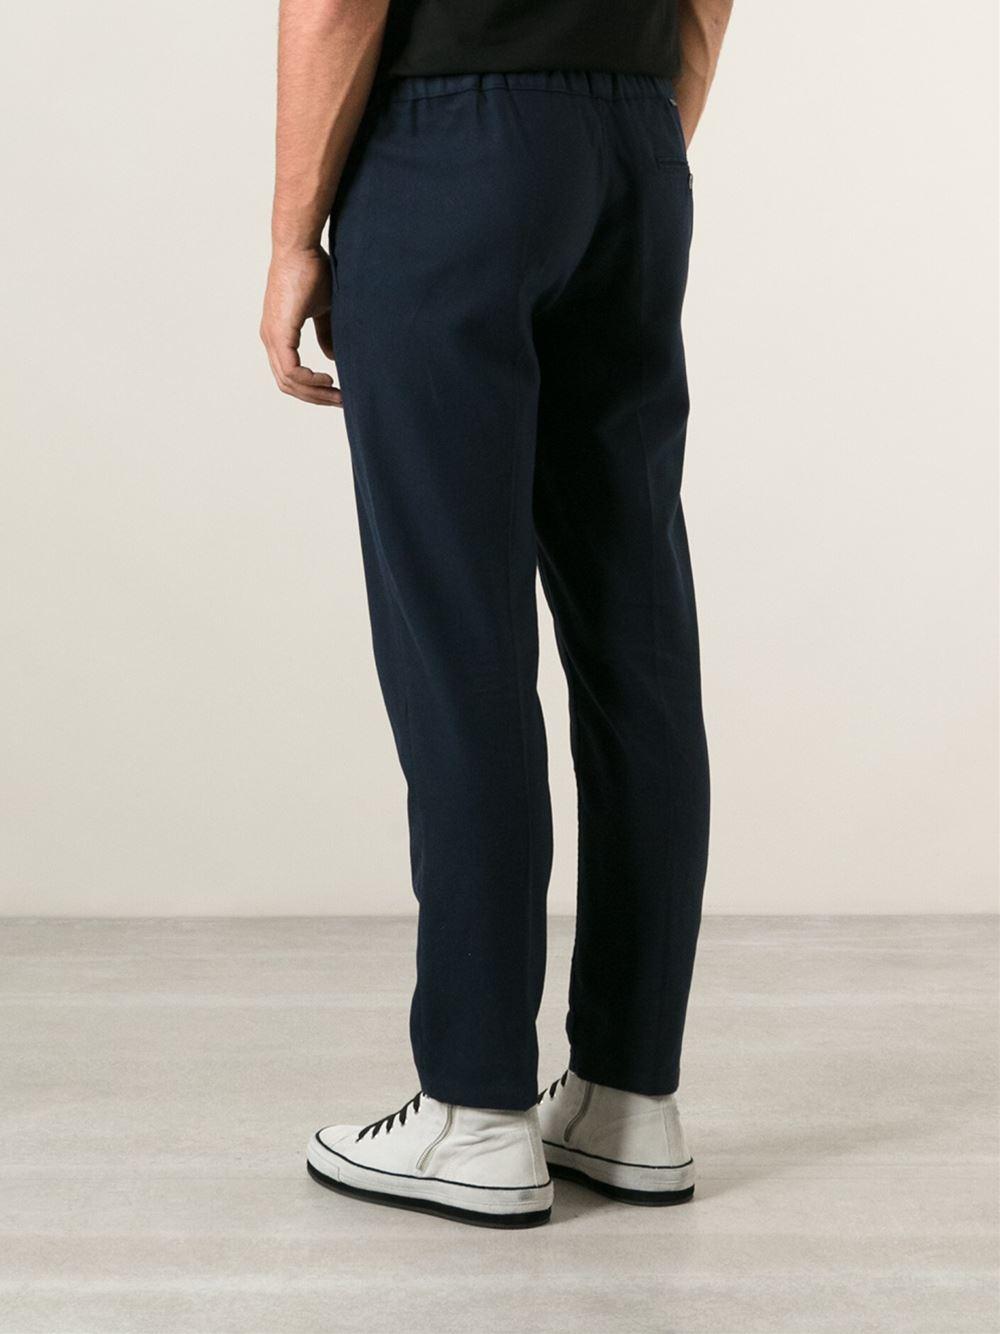 TROUSERS - Casual trousers Uniform dYGiX